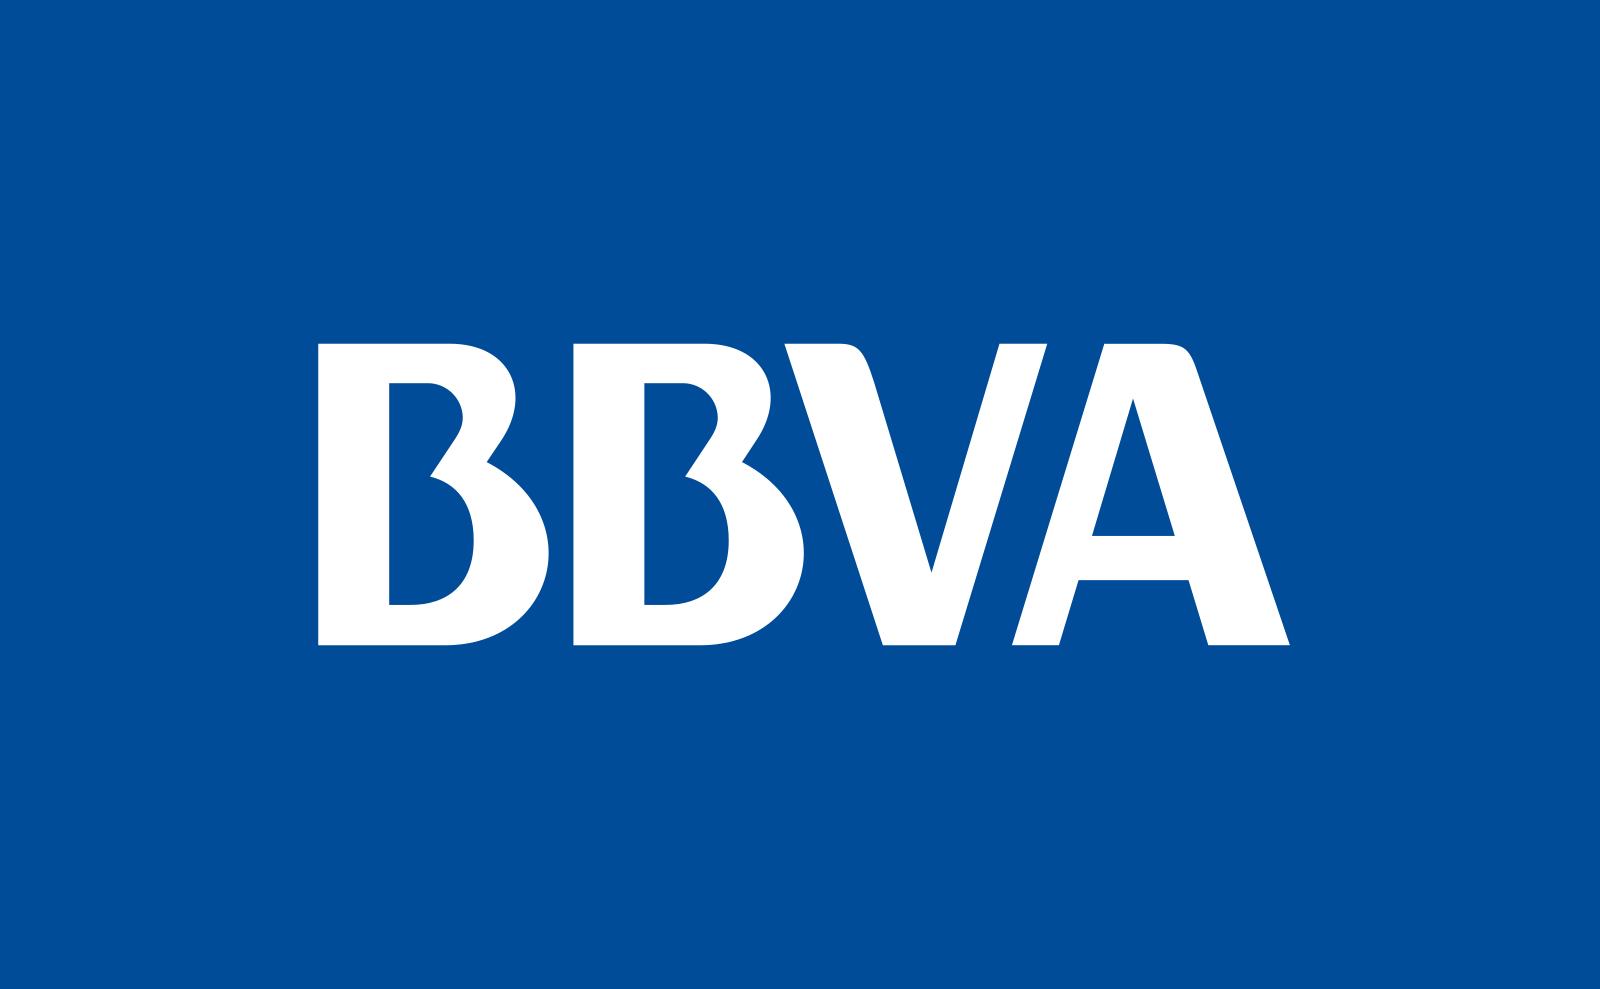 bbva-logo-5